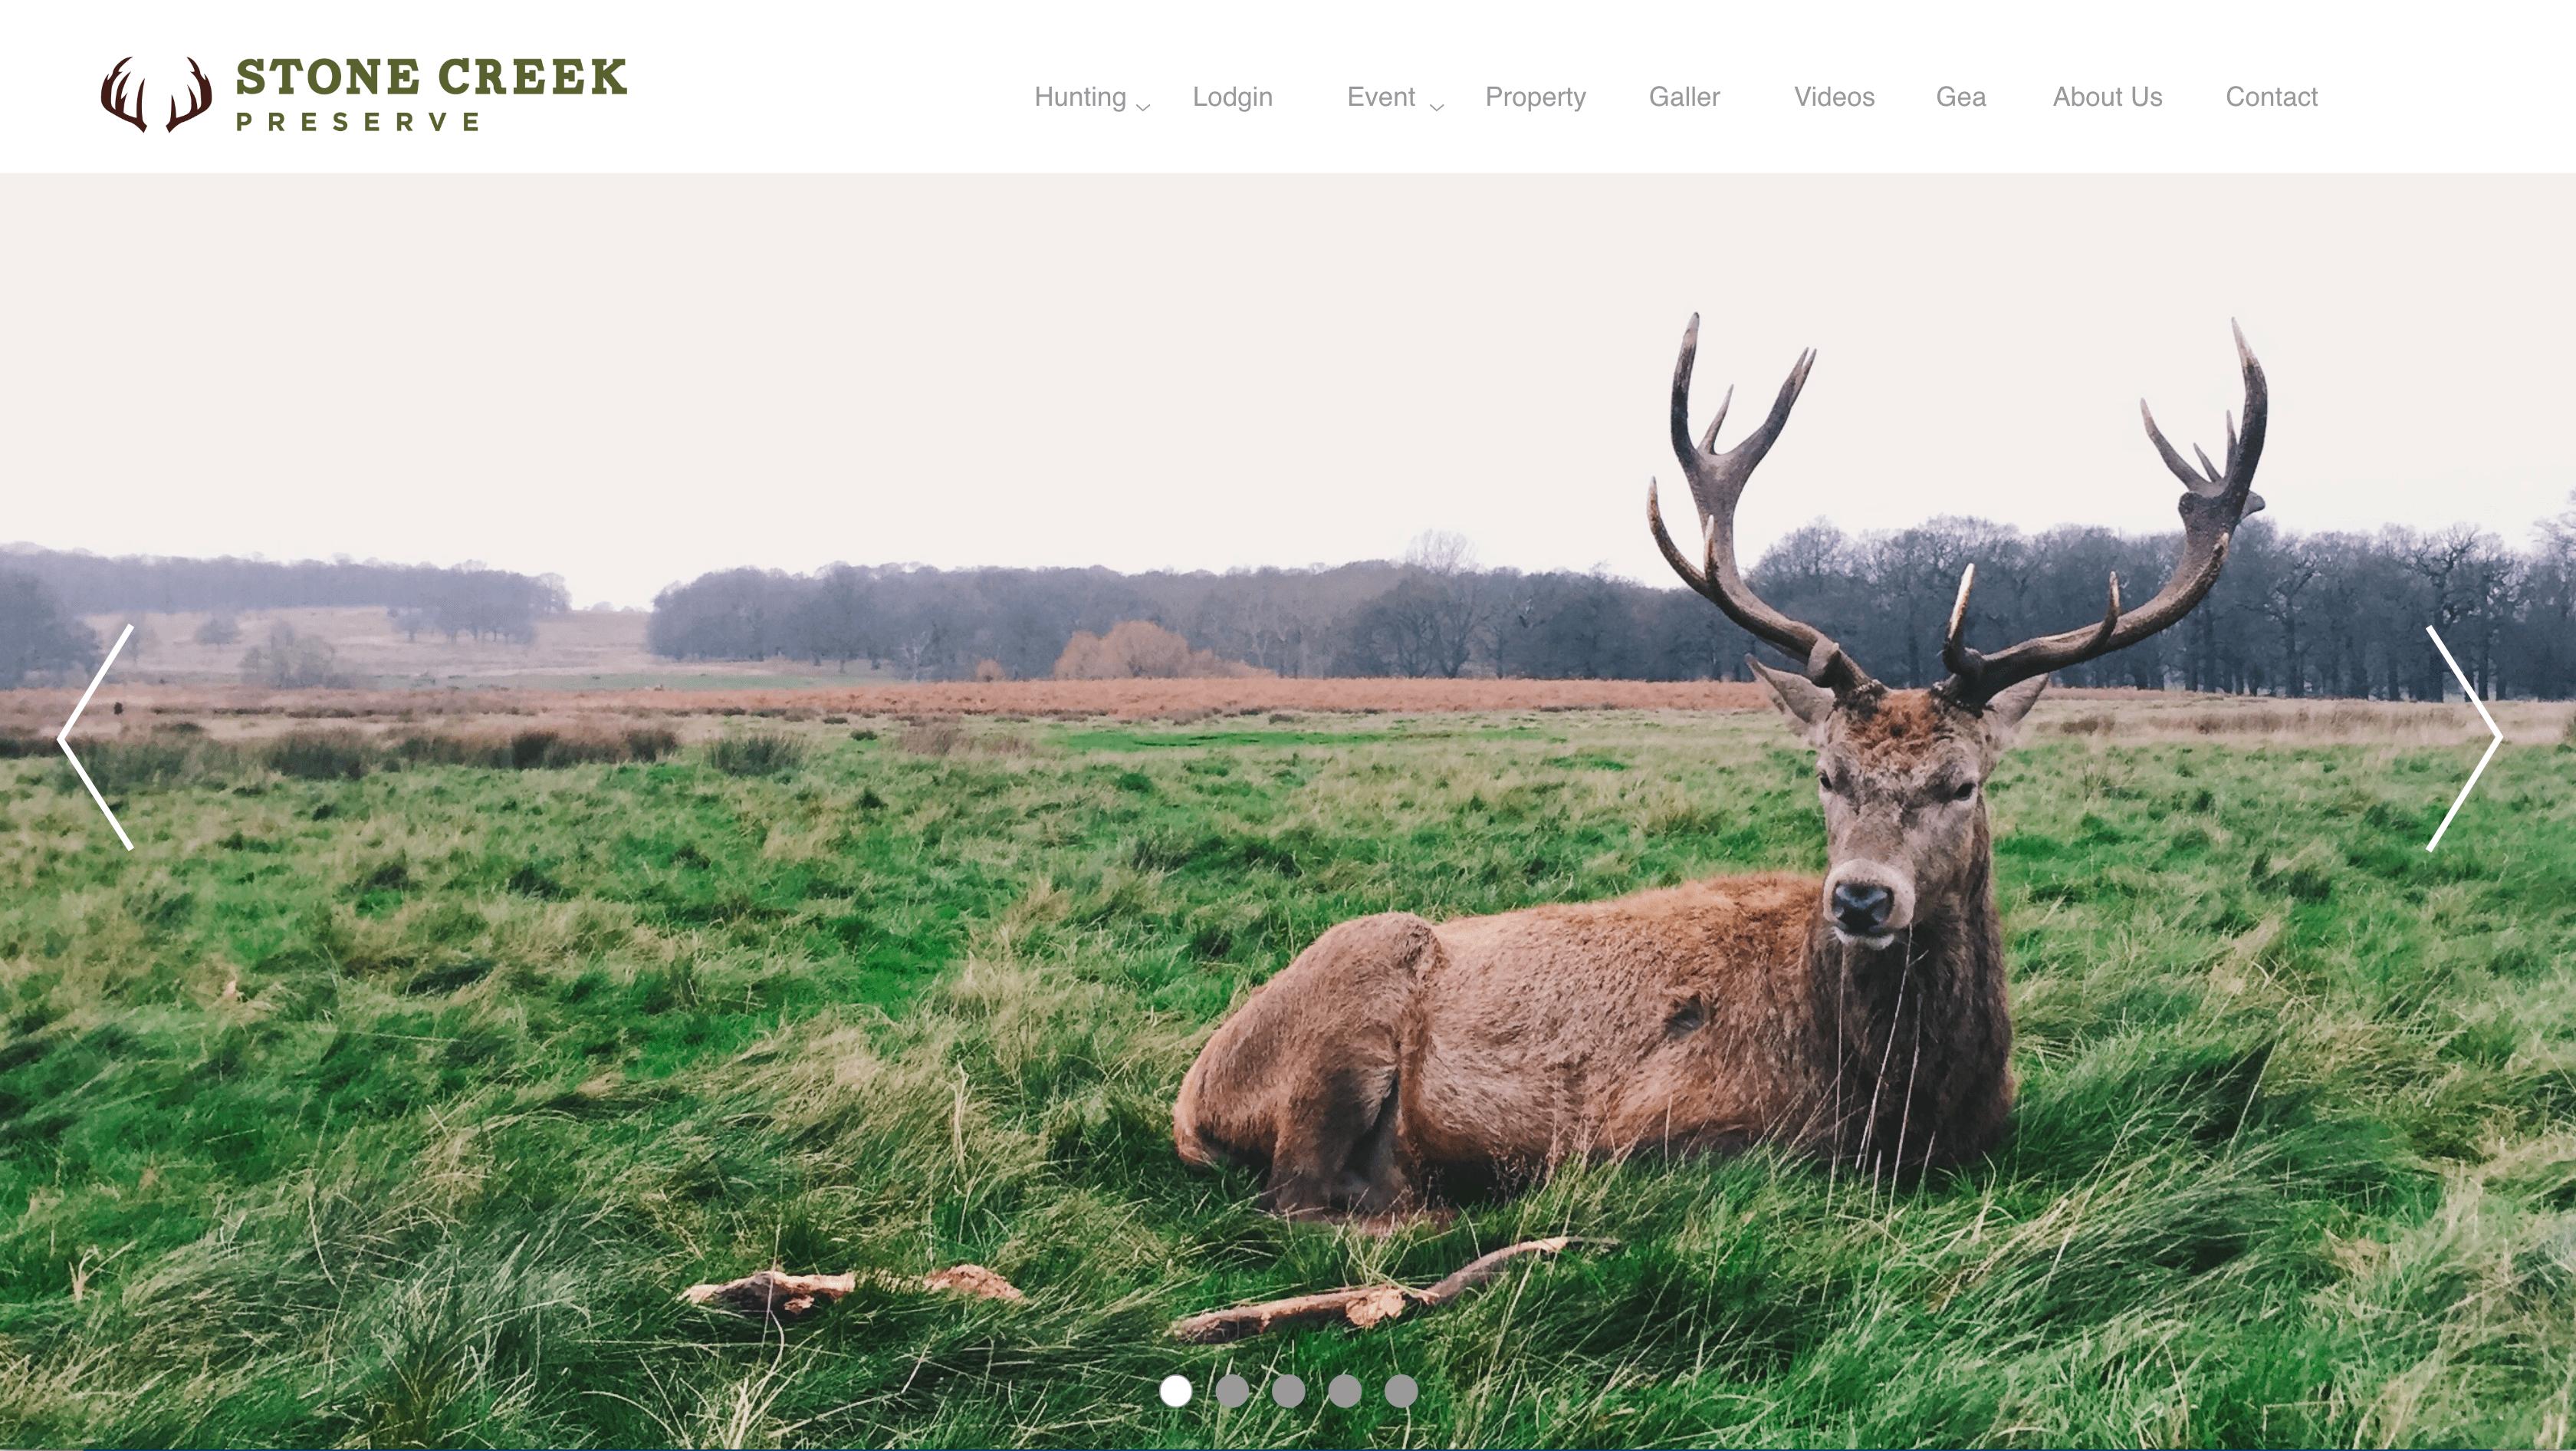 Stone Creek Preserve website